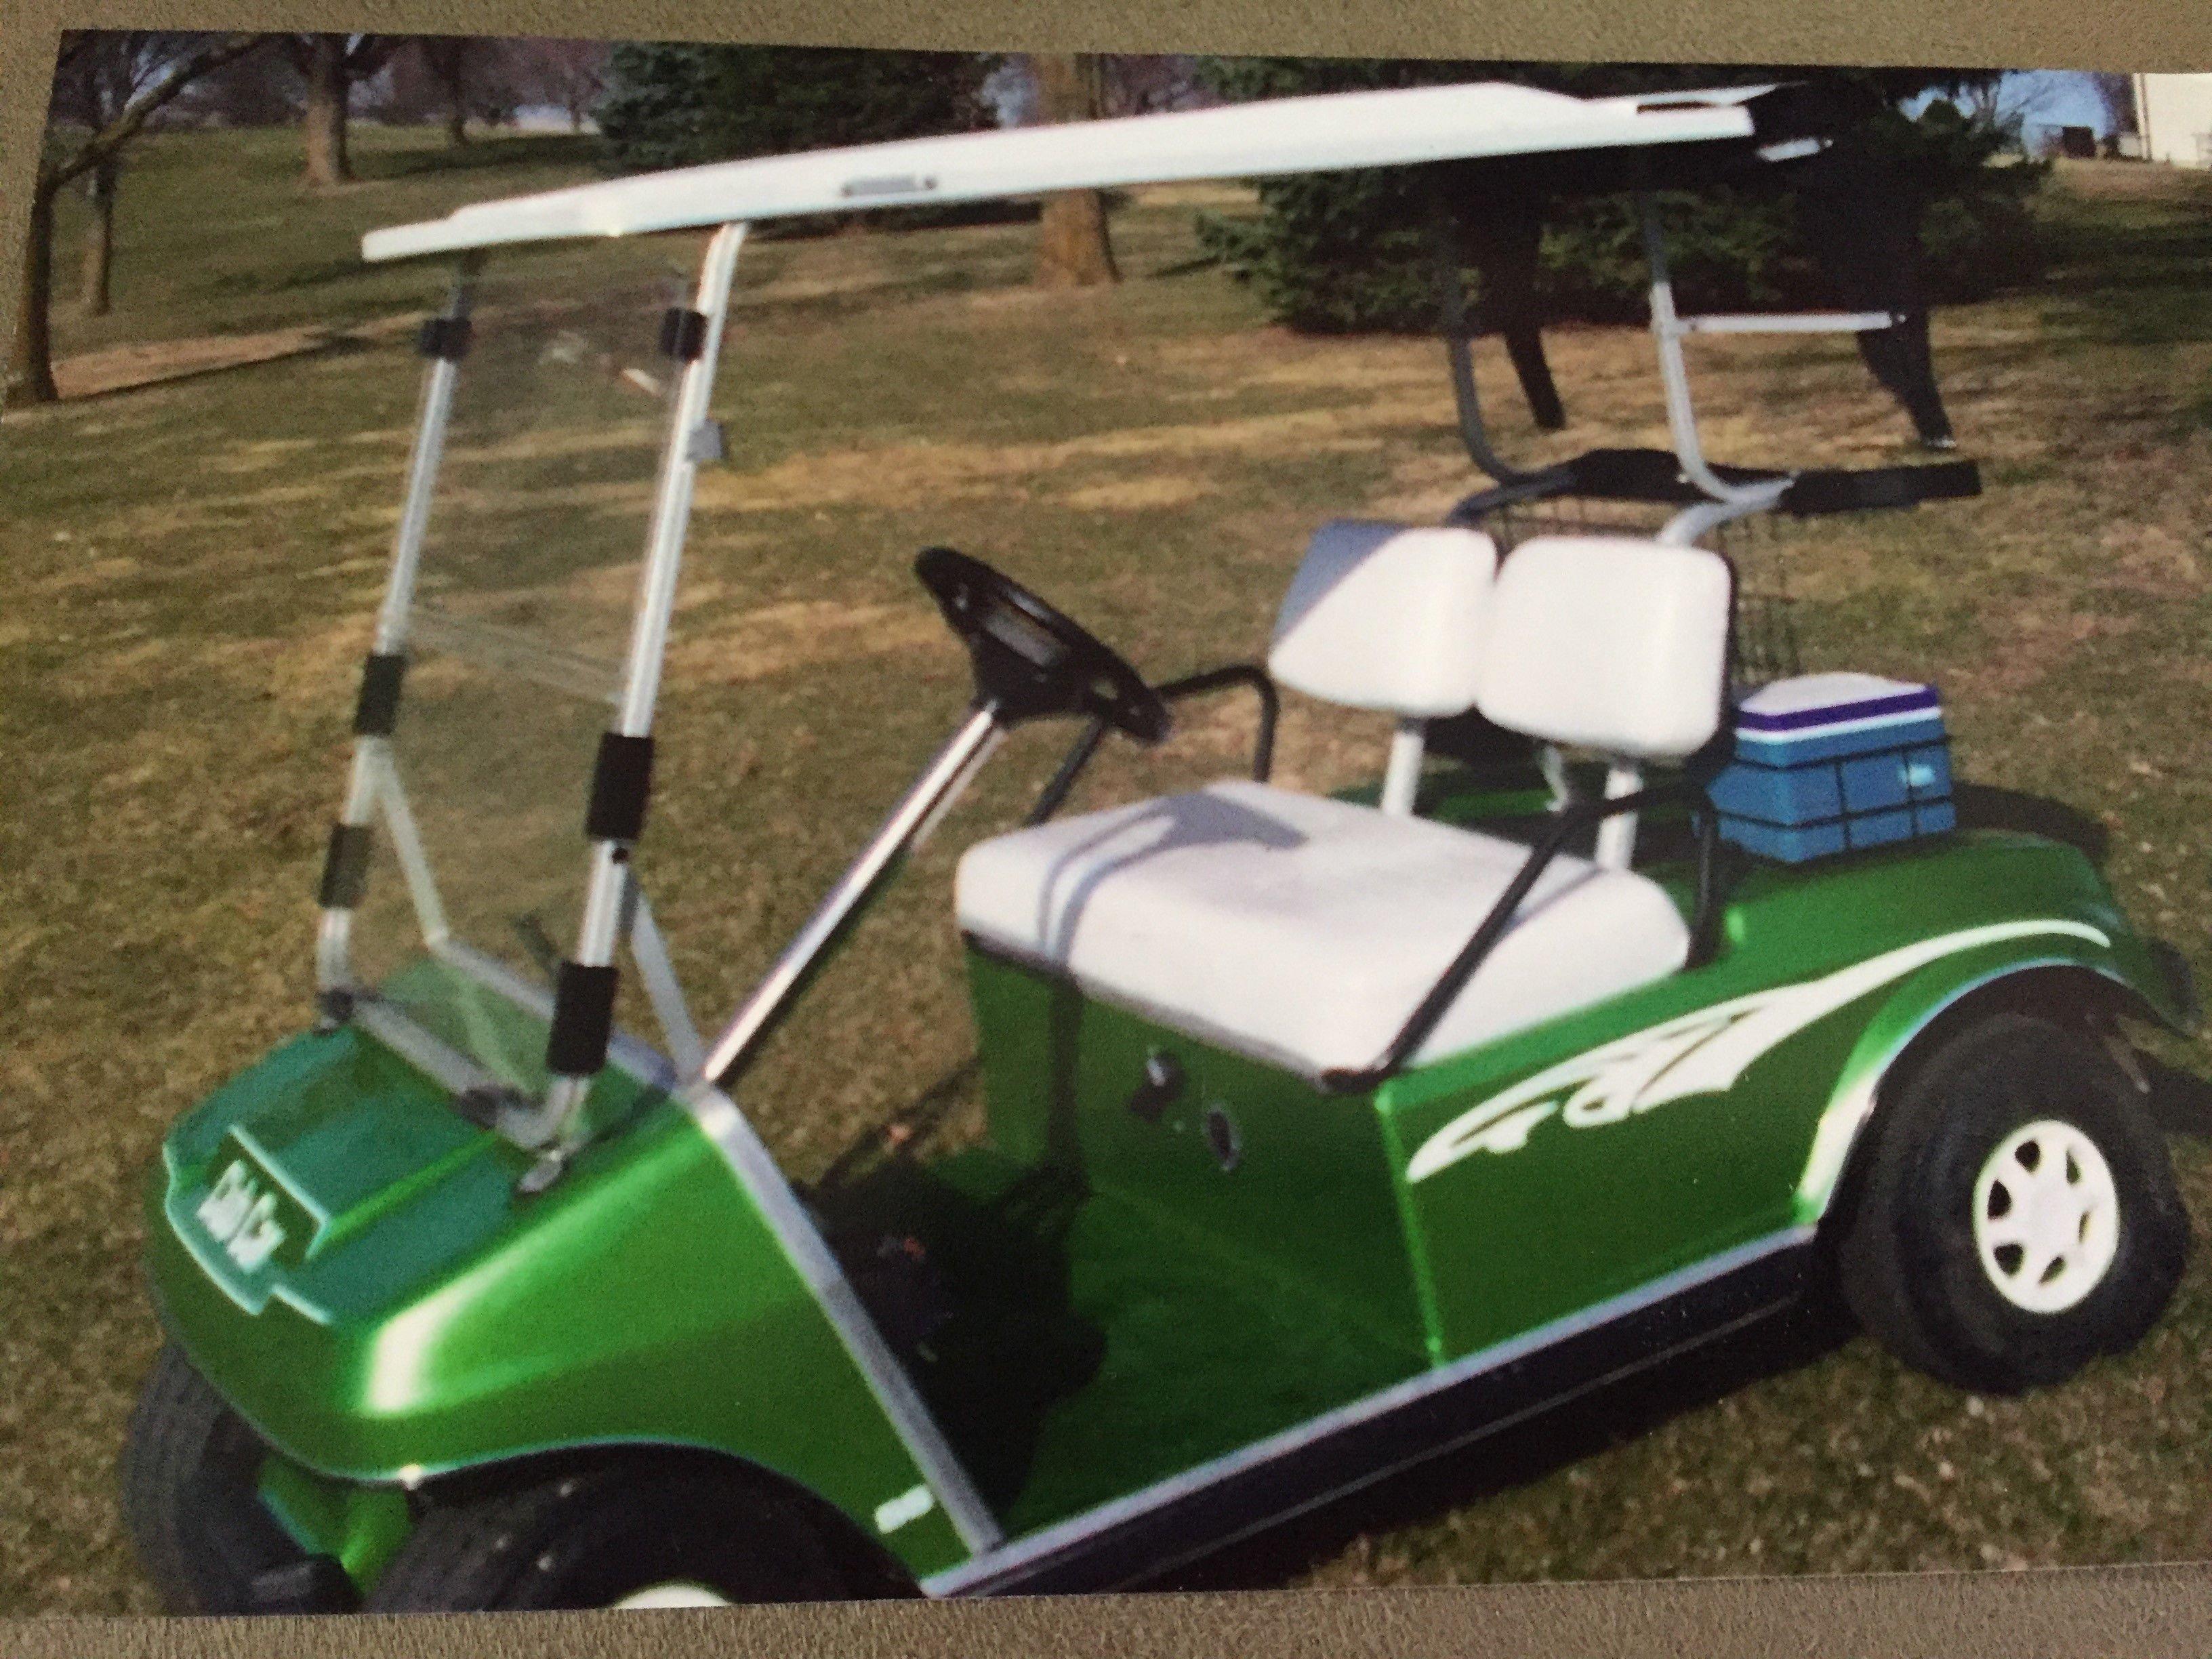 2 Electric Golf Carts for sale Lawn Garden Patio kmalandcom